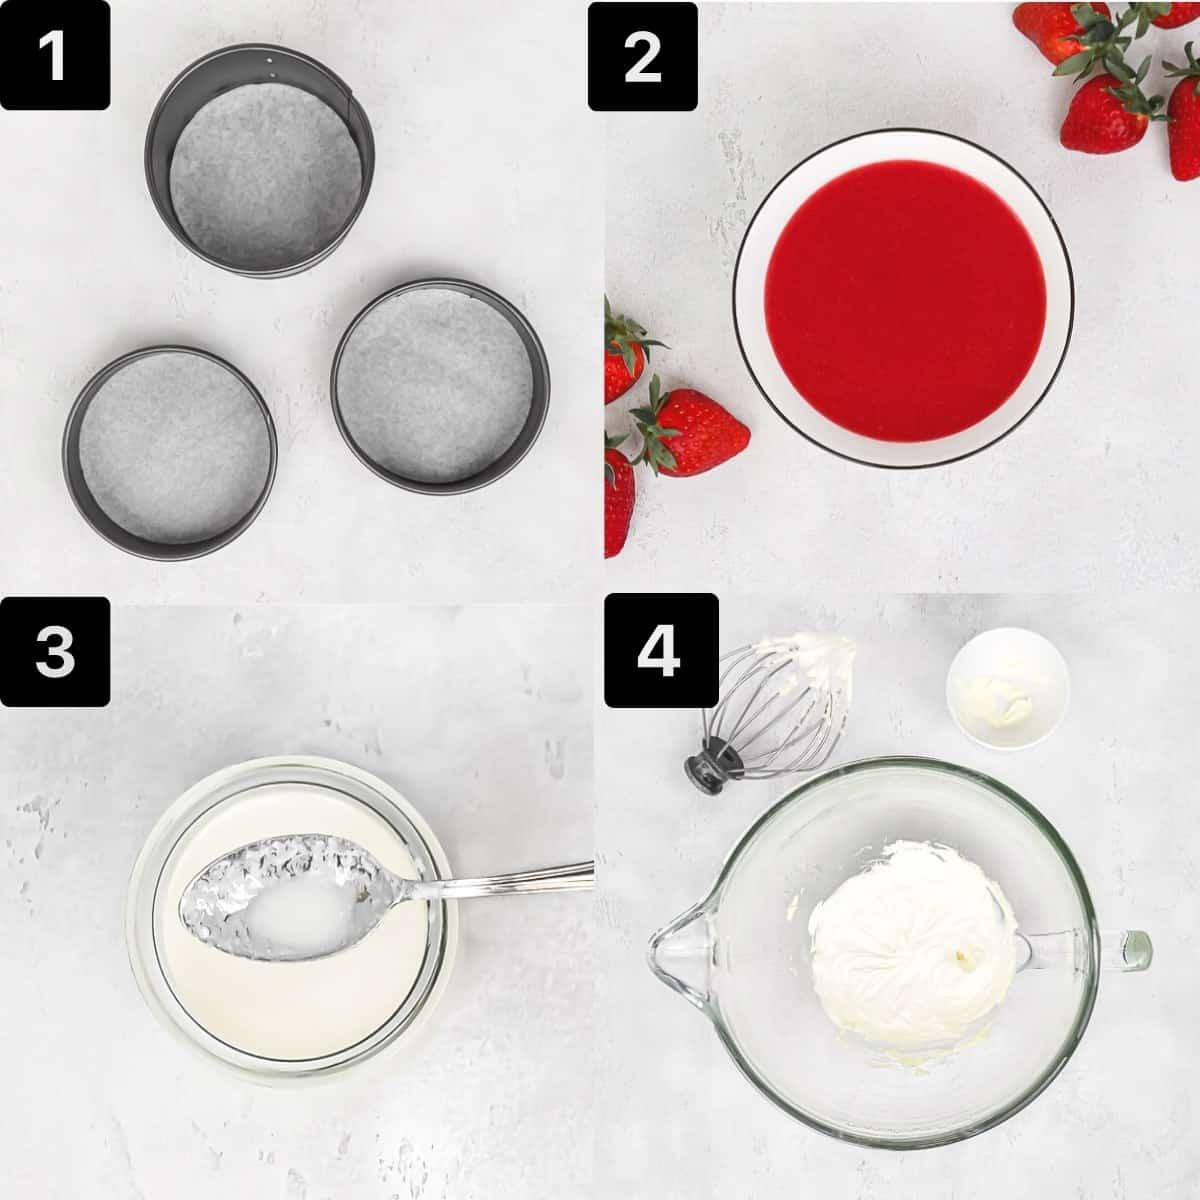 Cake Process 1: line pans, puree strawberries, make buttermilk, cream butter.